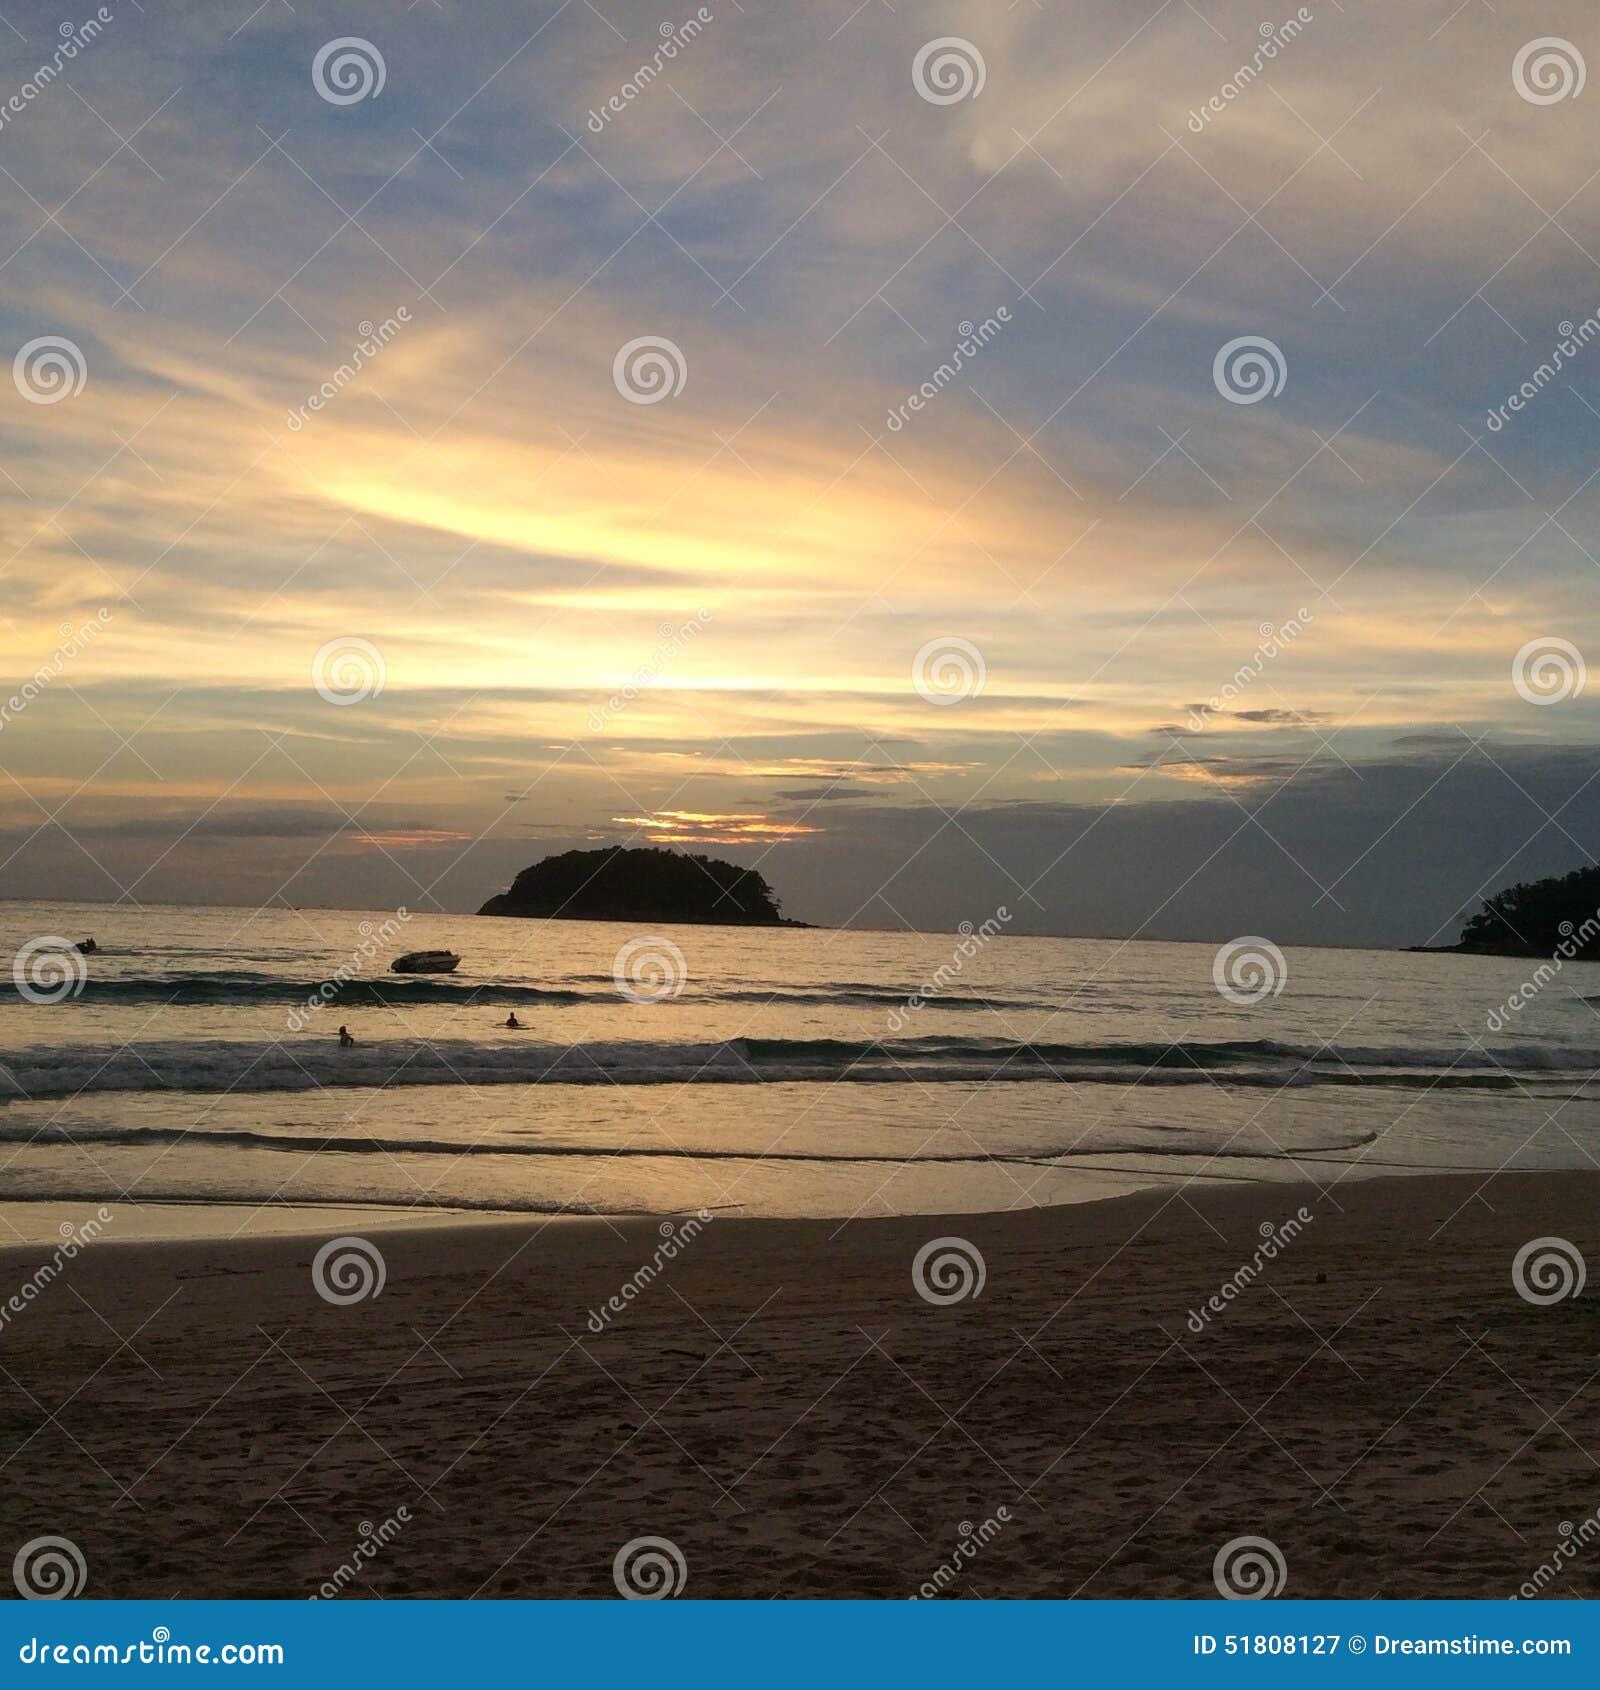 Island Beach People: The Greatest Sunset Stock Image. Image Of Island, Beach